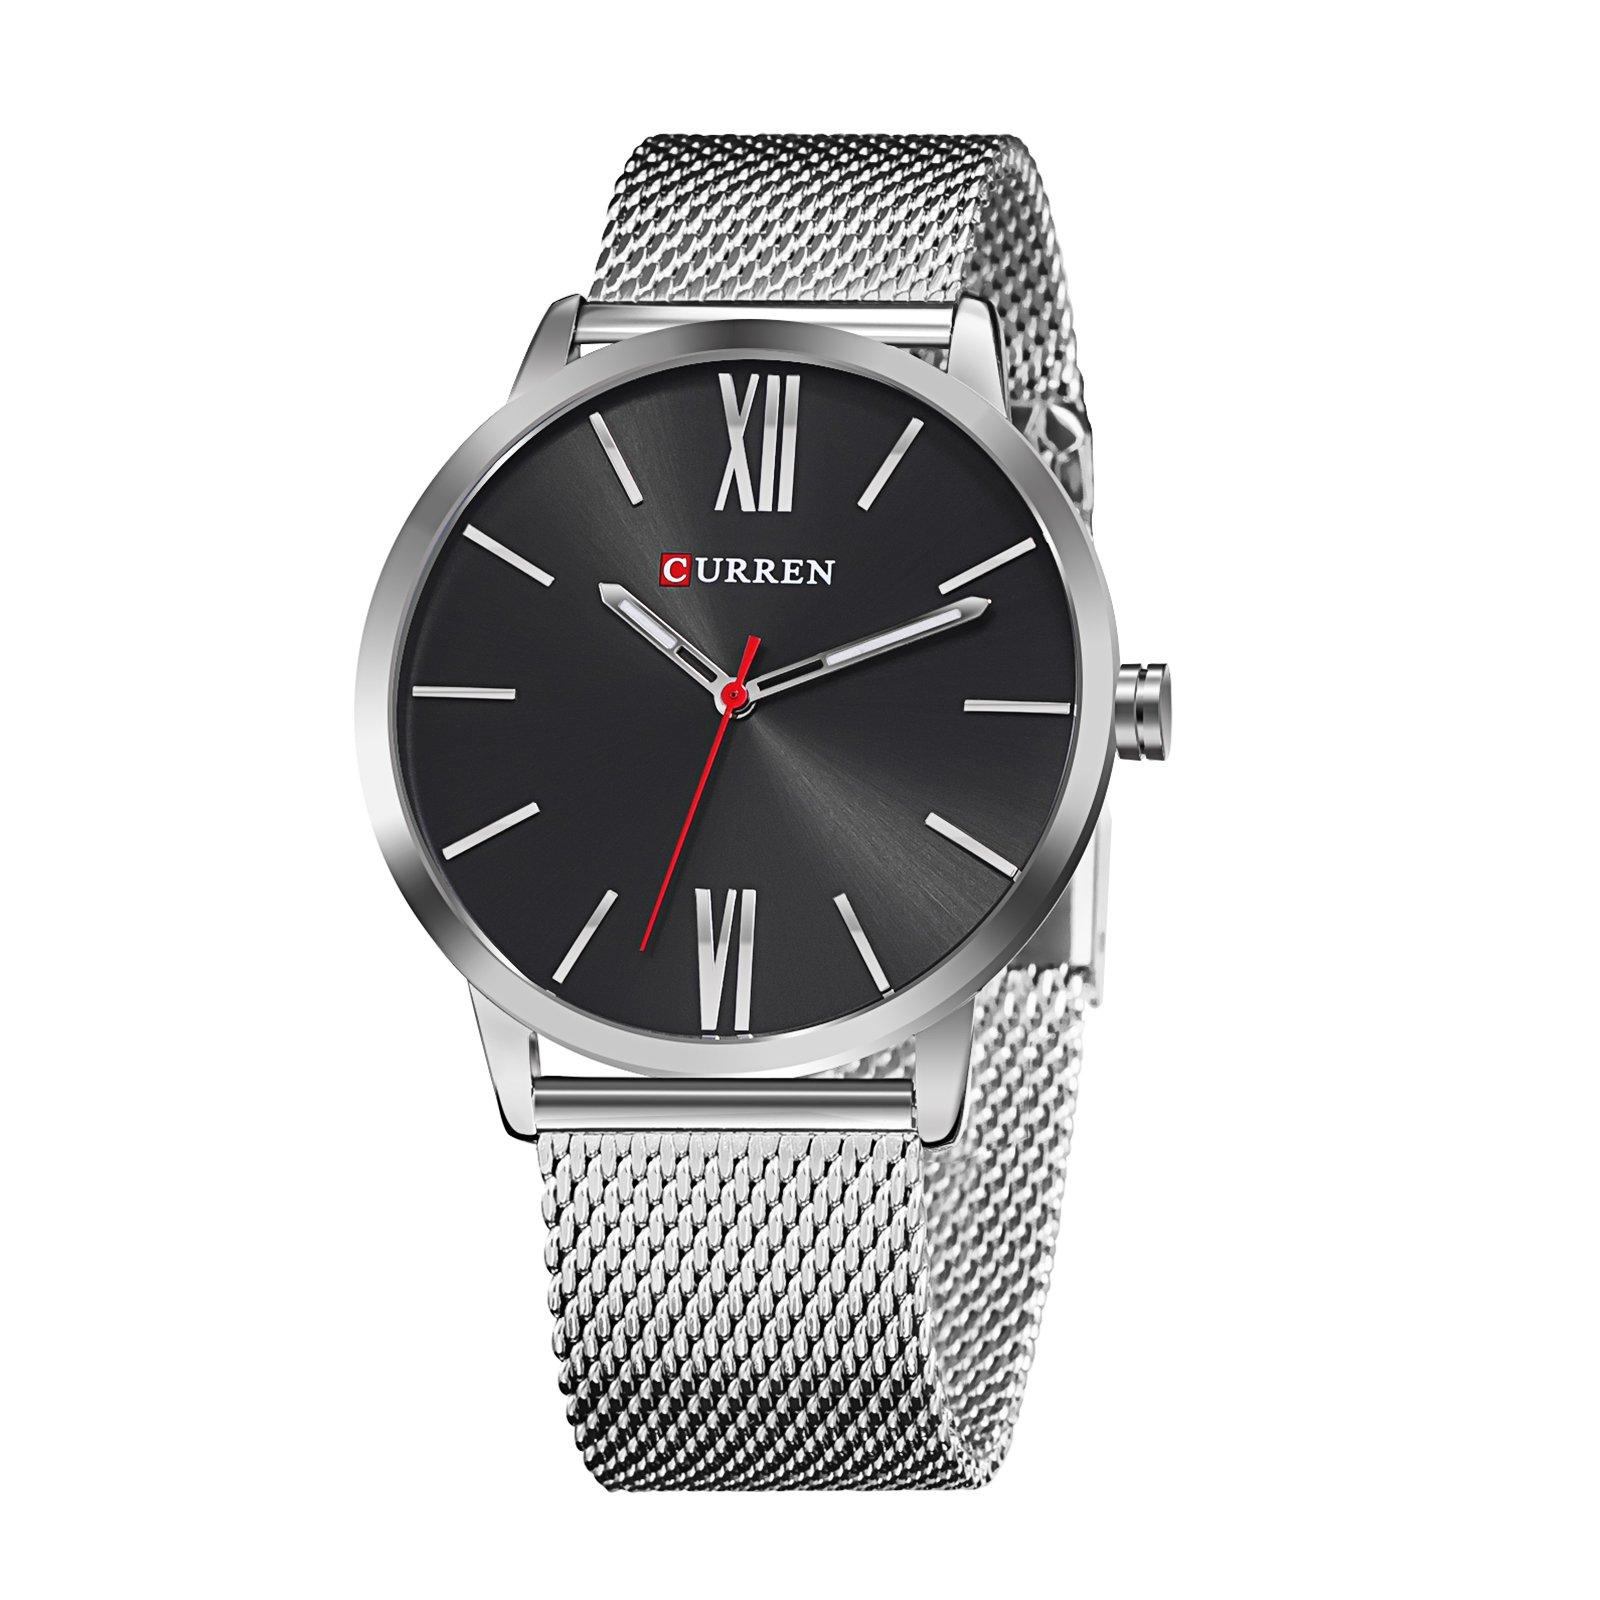 TREEWETO Men's Slim Mesh Wrist Watch Roman Numerals Silver Band Black Dial Bisiness Dress Black Watch